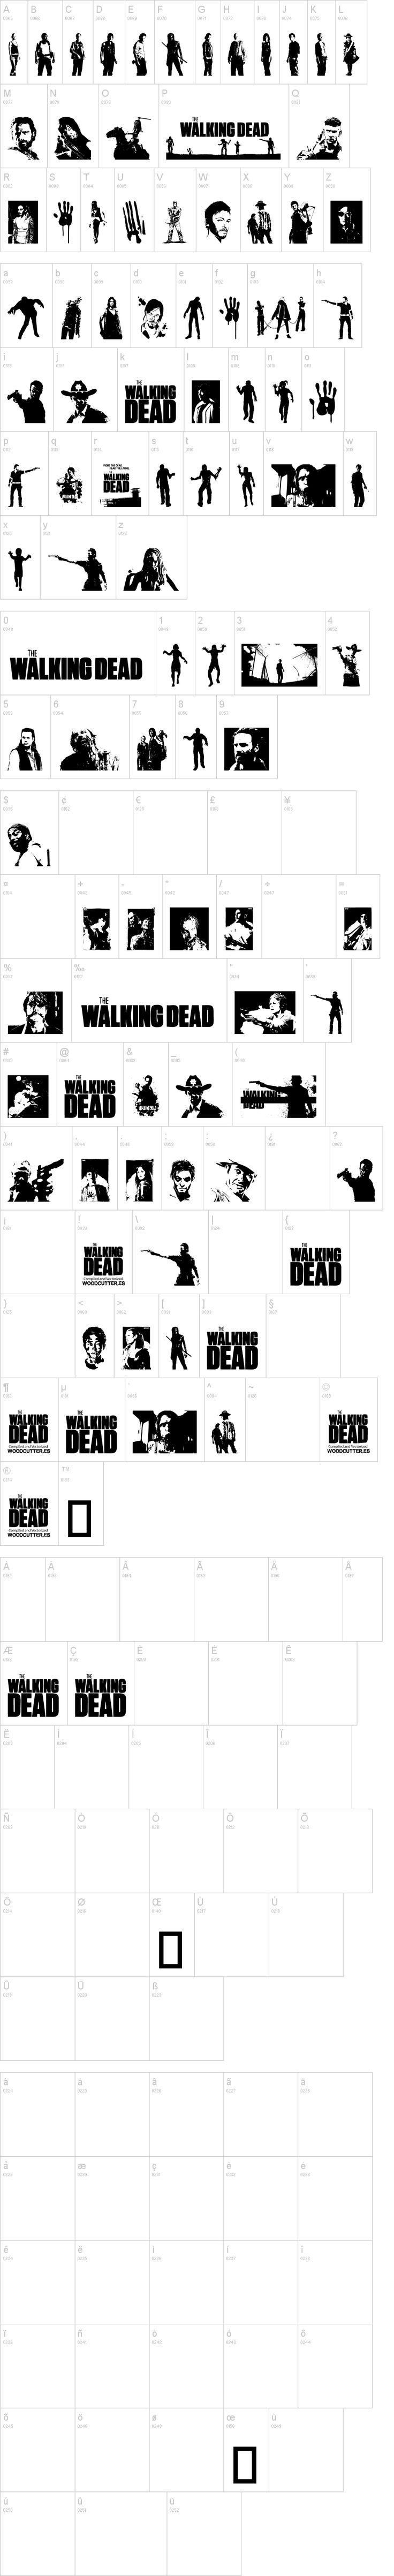 The Walking Dead - The Font. #thewalkingdead #dafont